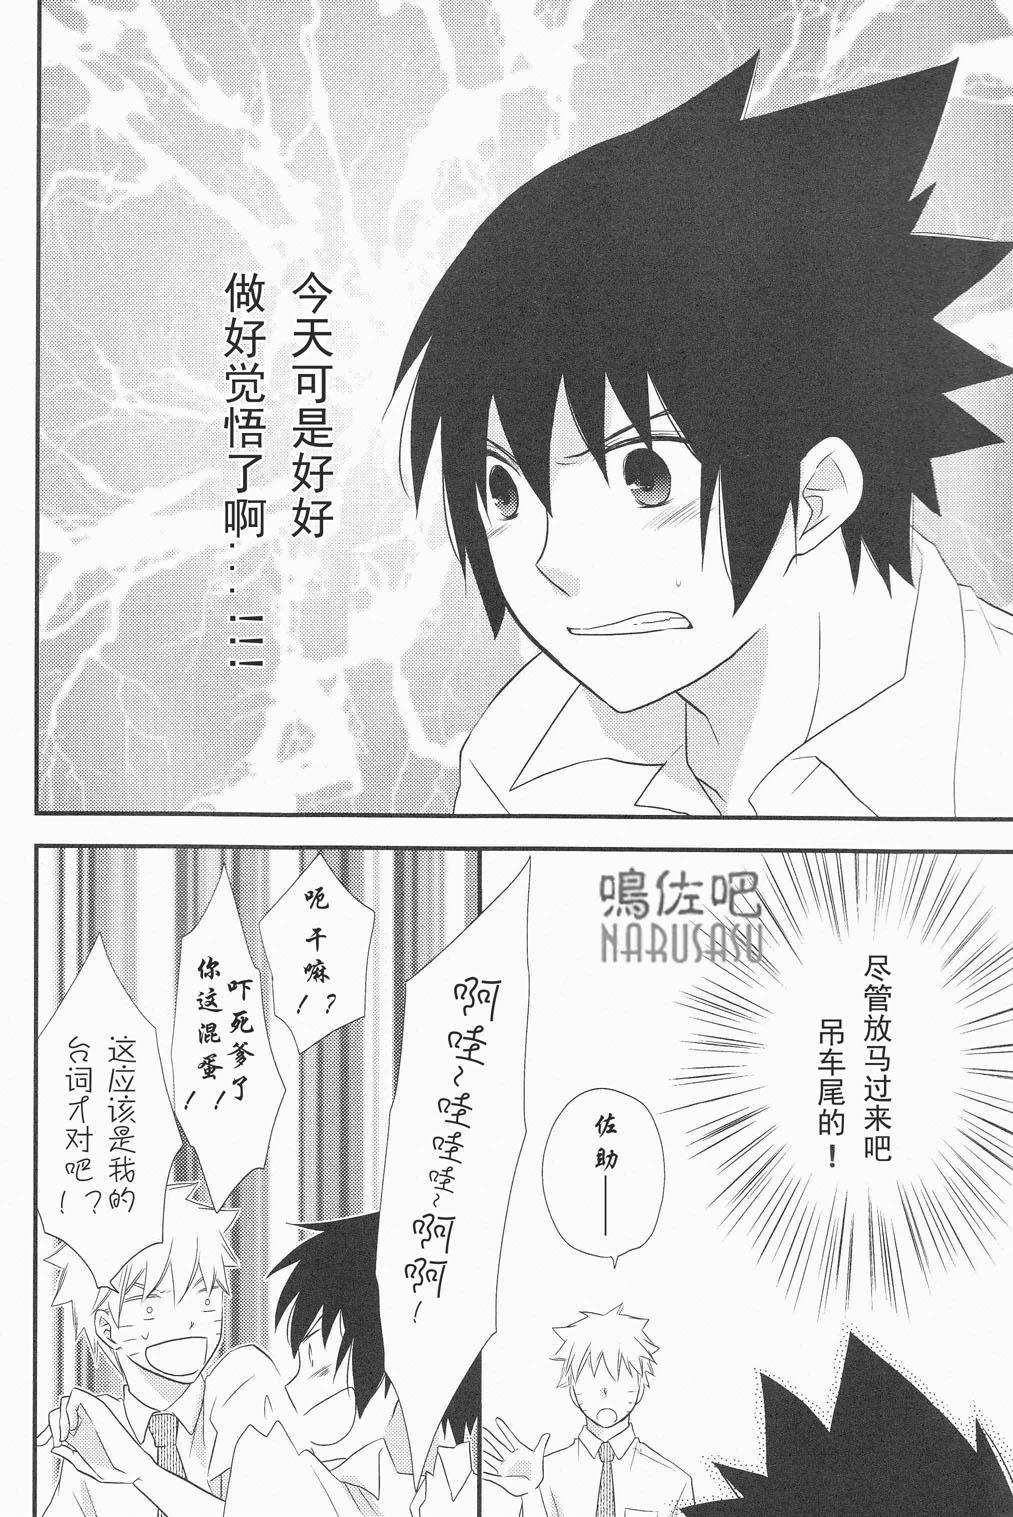 【同人漫画】eat me!(r18)汉化 - v